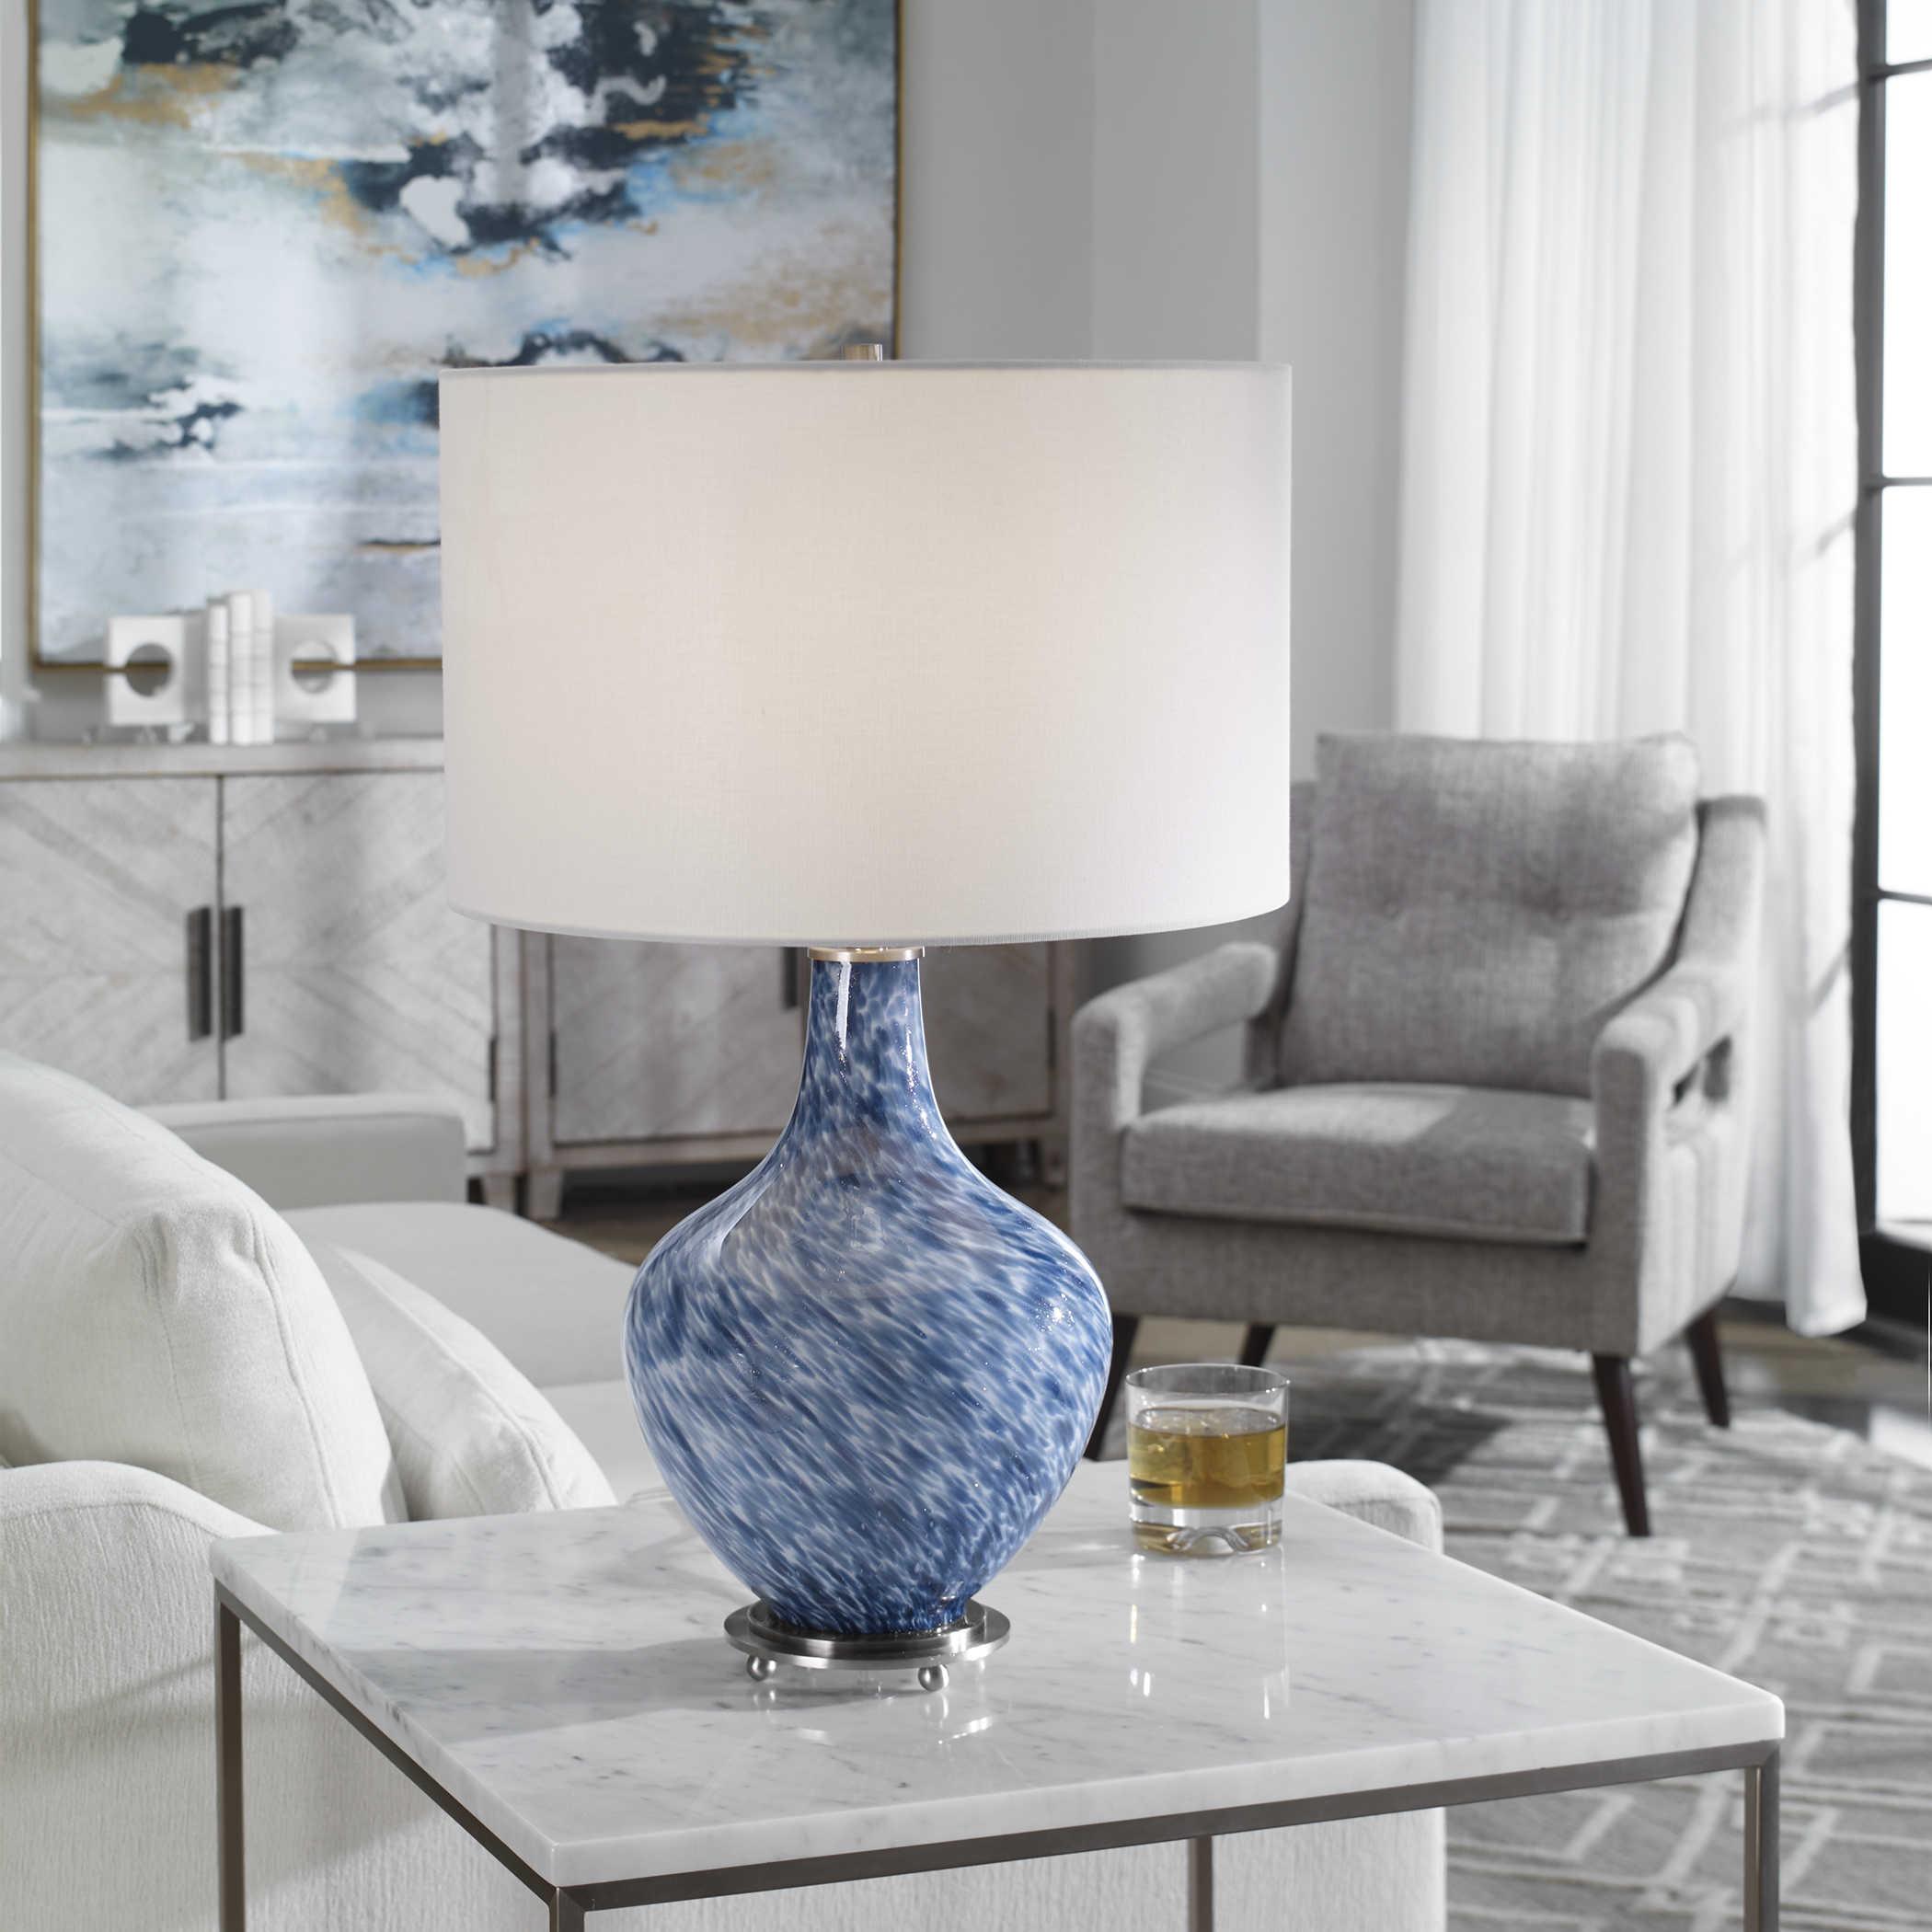 Coastal Inspired Lamps